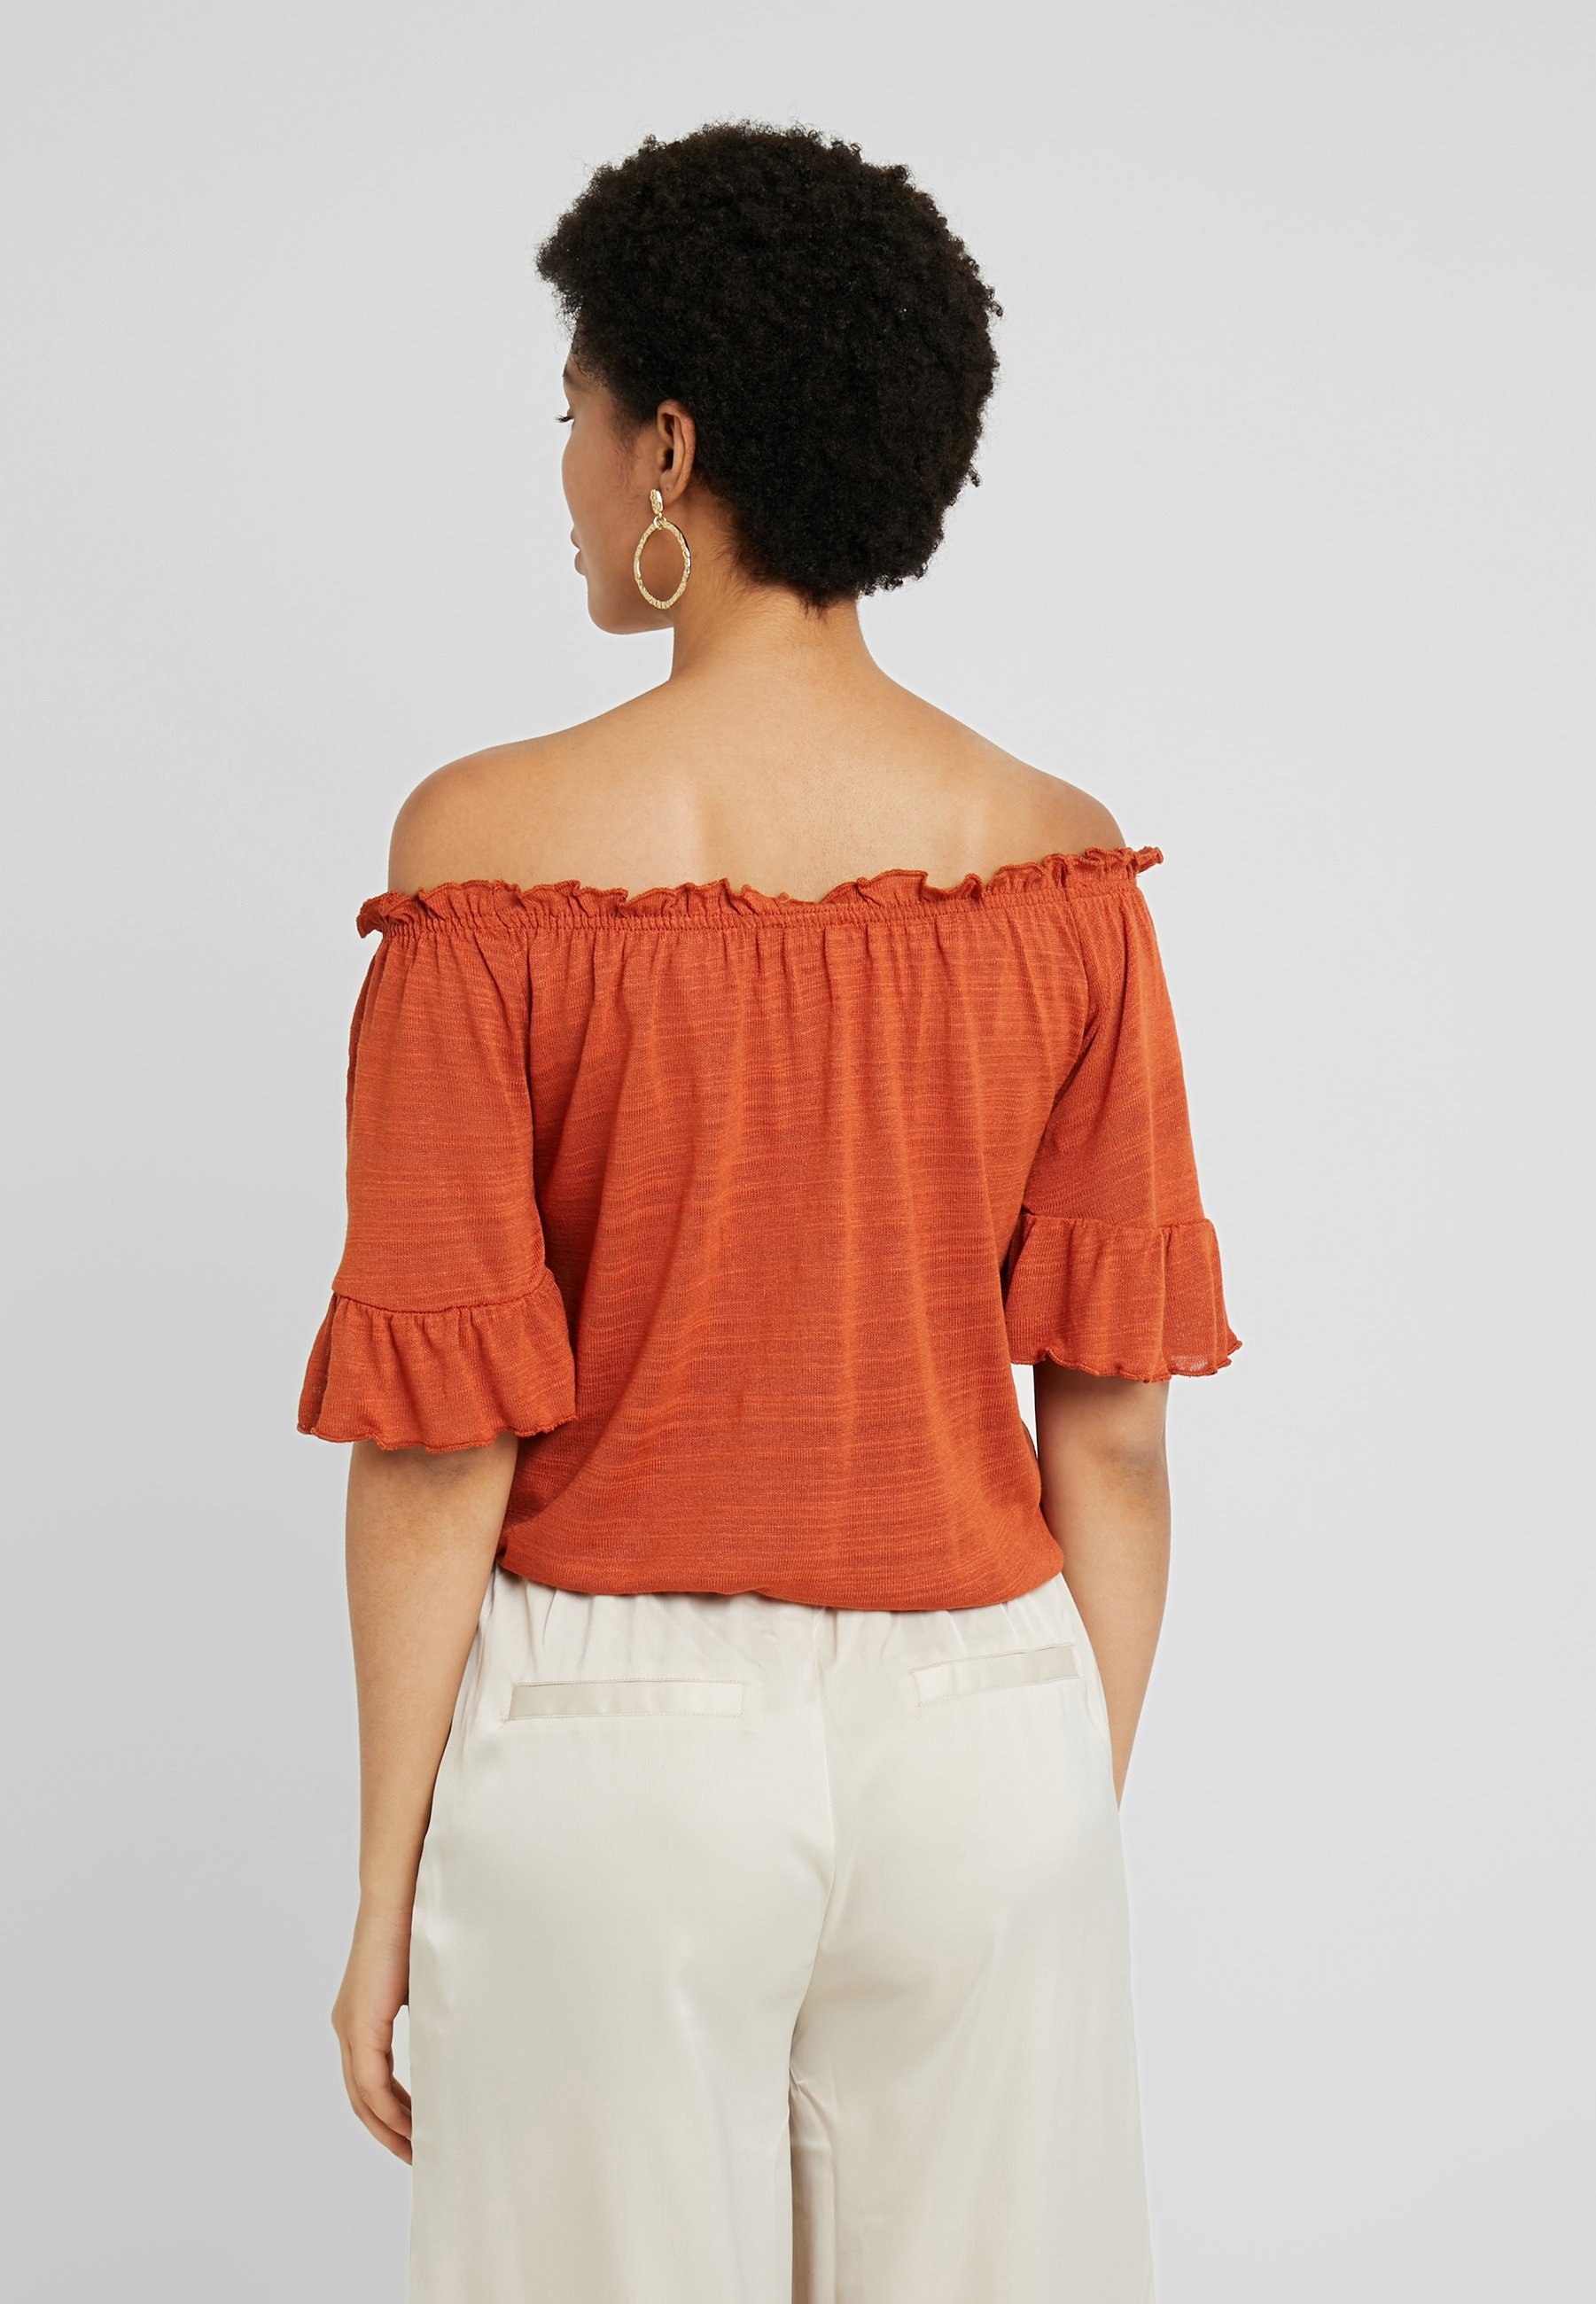 Bombay Brown Embla Tricot Gina Off ShoulderT shirt Imprimé YIgby7vmf6